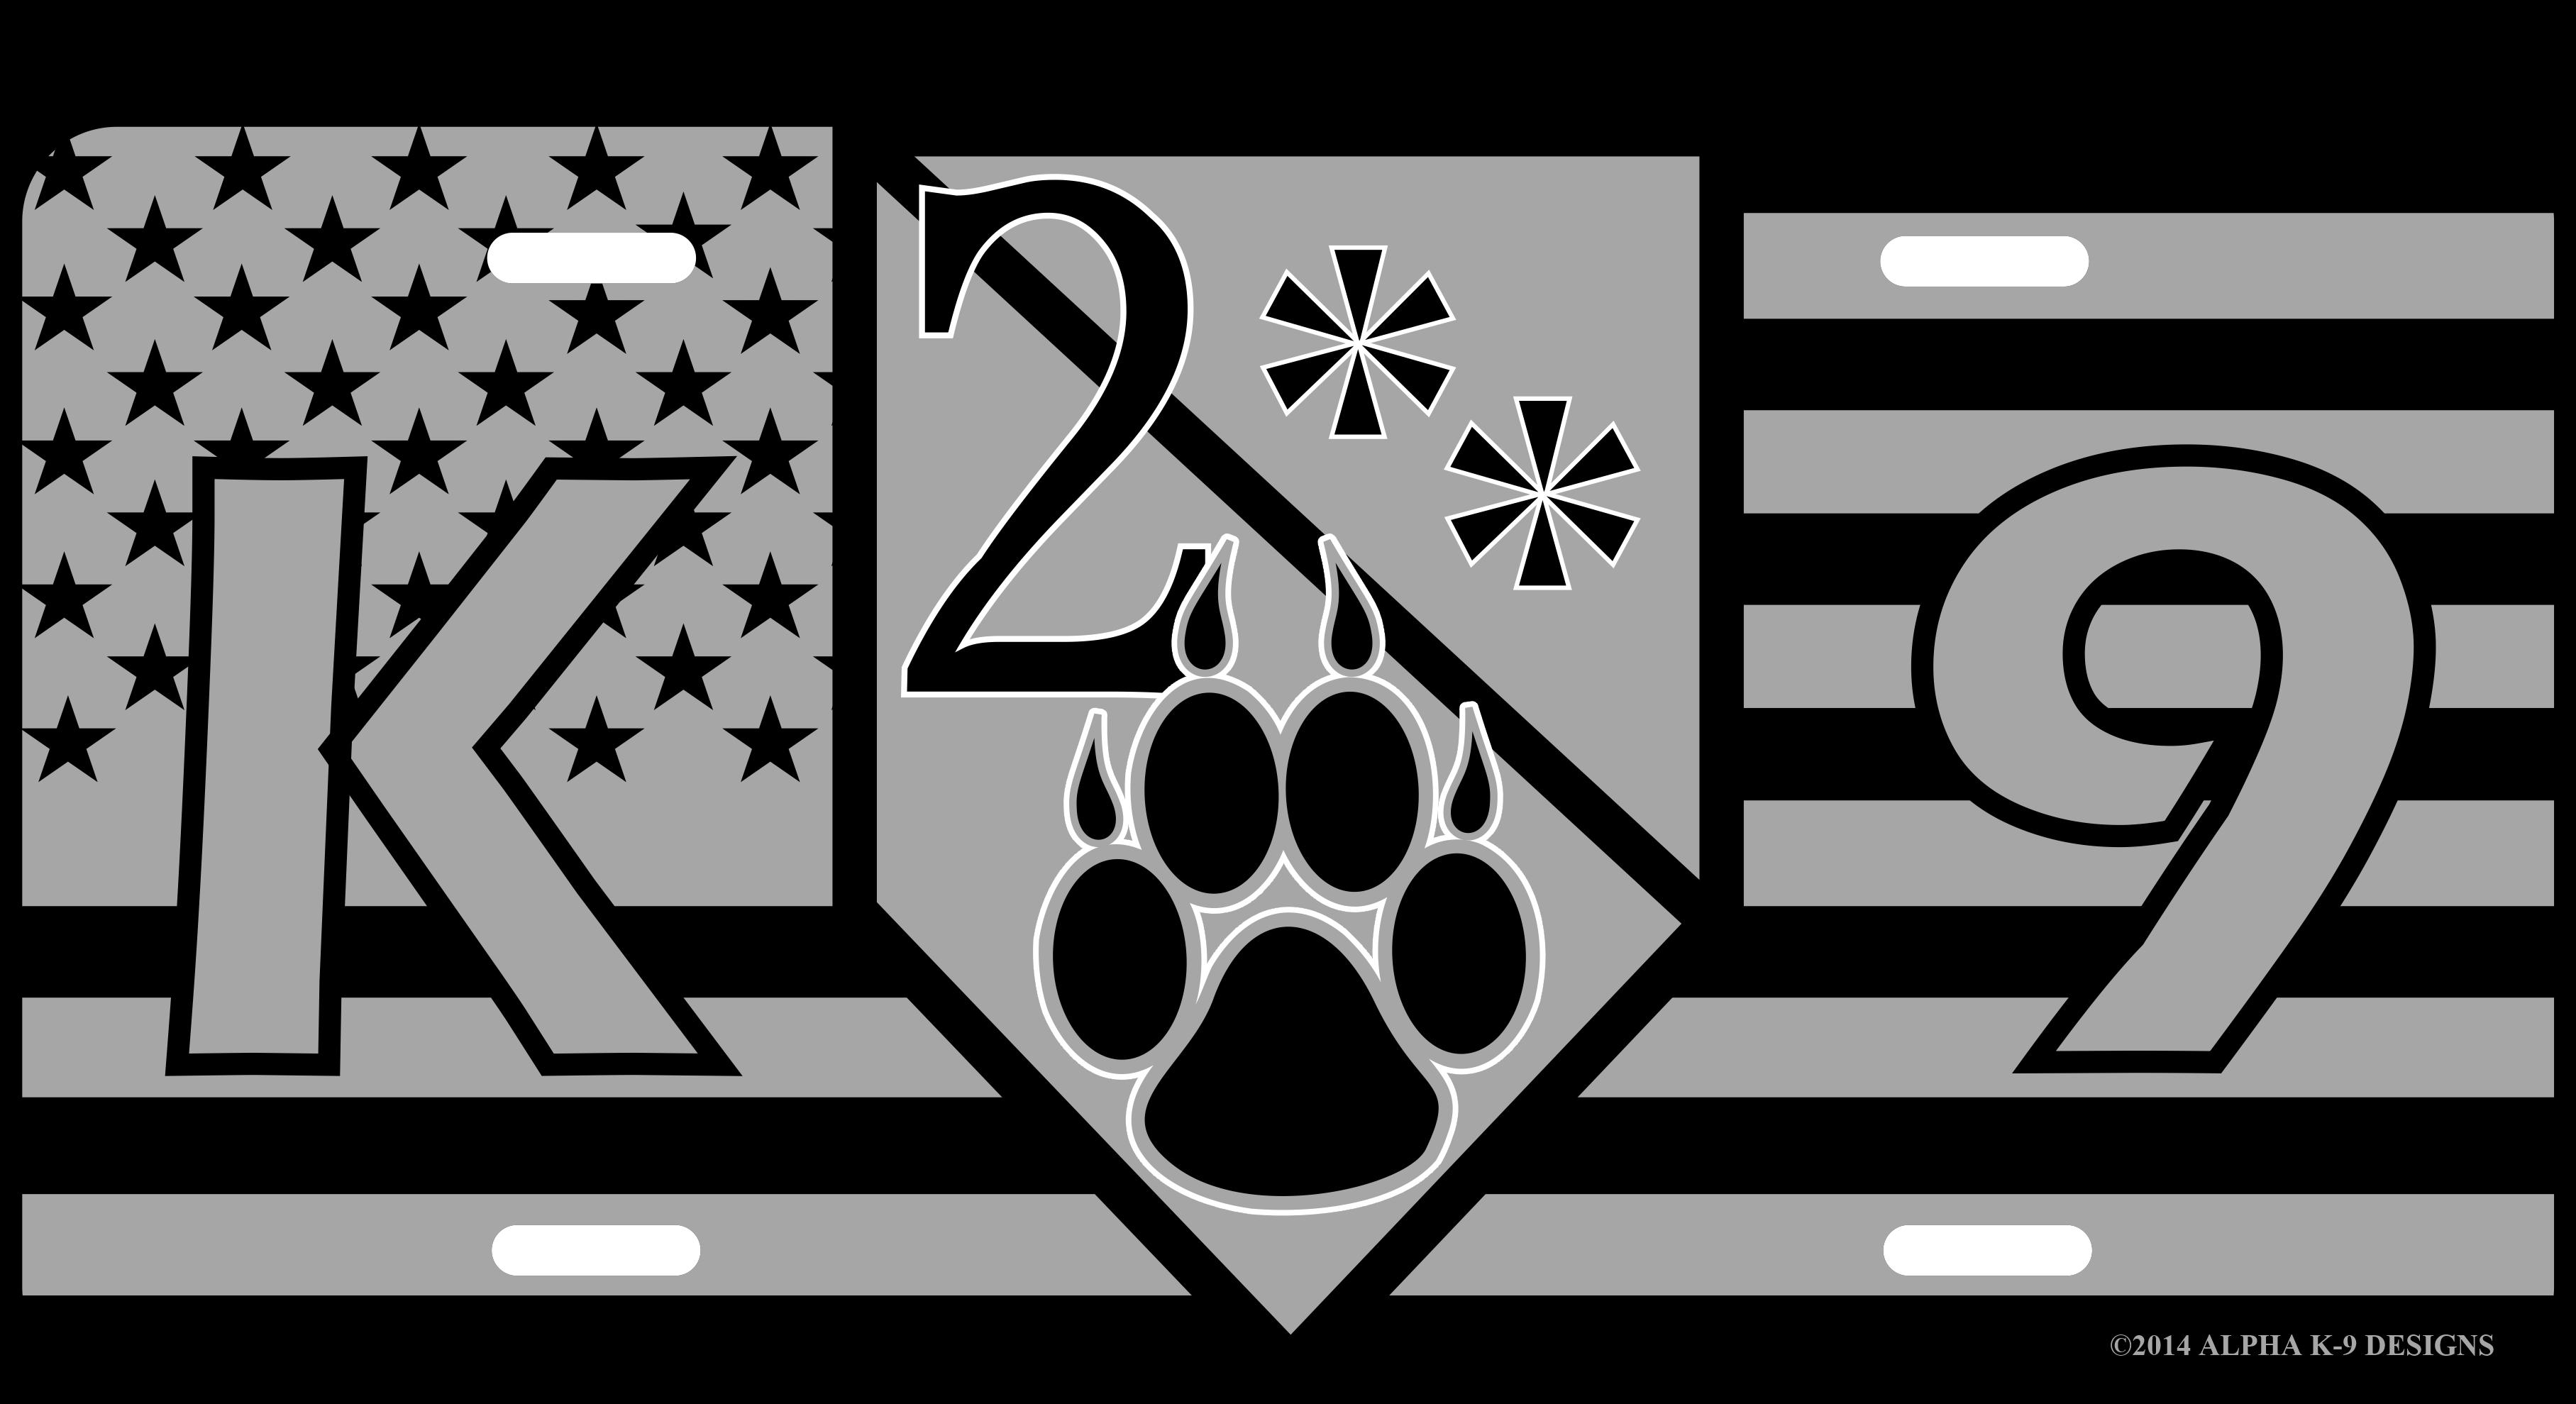 American 2 K9 Flag License Plate 183 Alpha K 9 Designs Llc